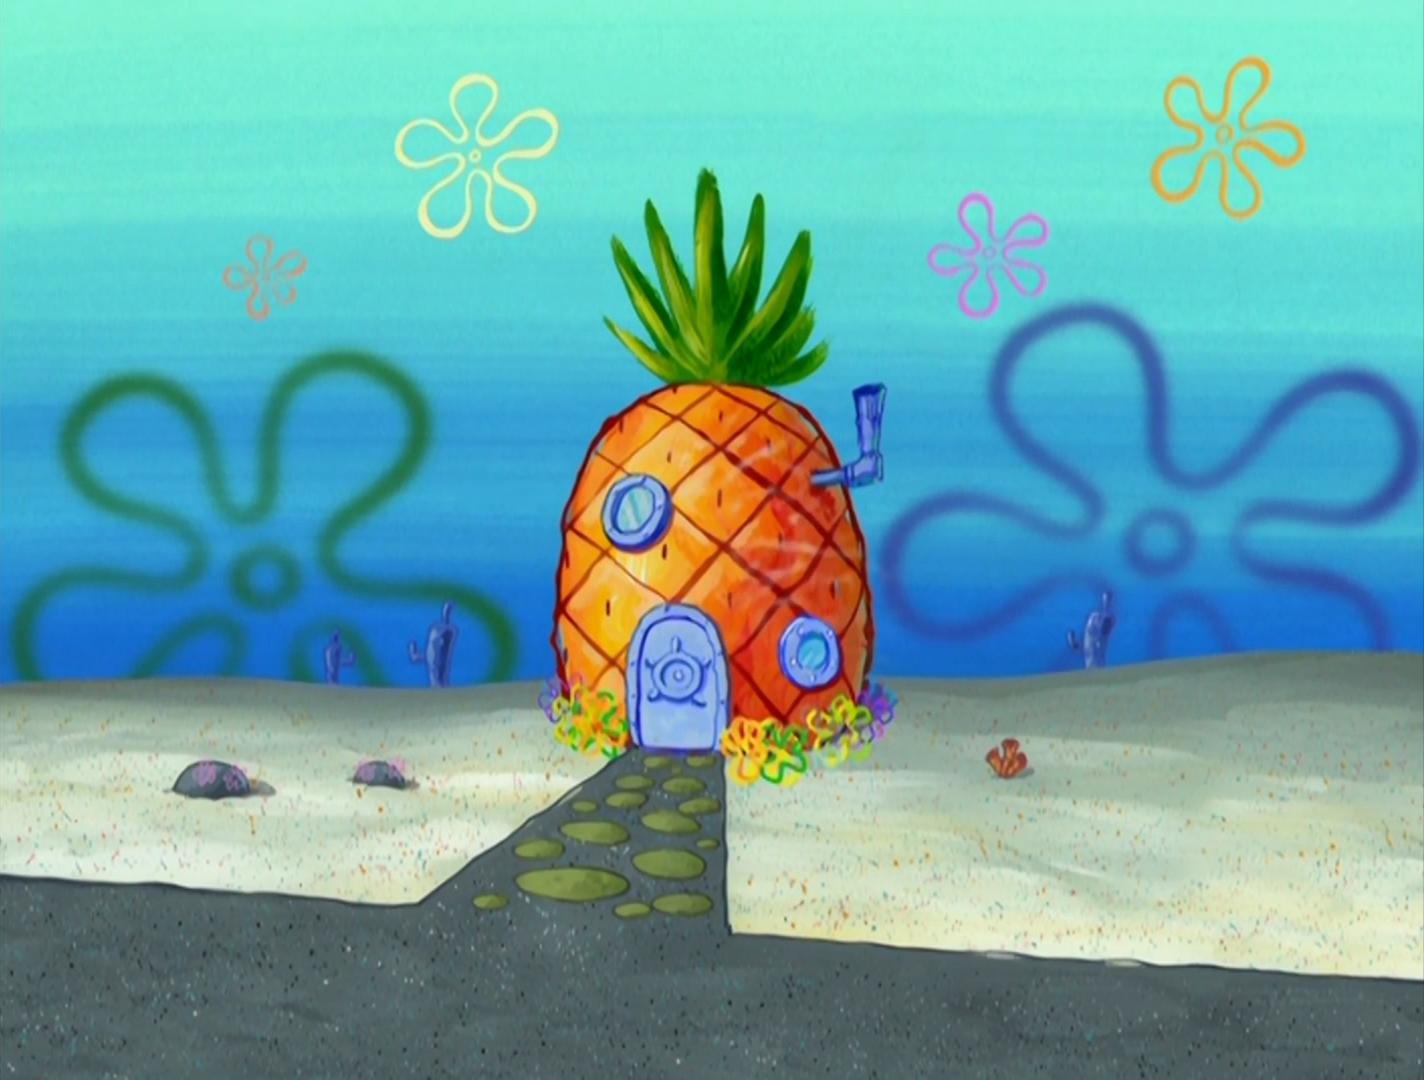 Pineapple House for SpongeBob | Spongebob wallpaper, Spongebob house, Wall  painting